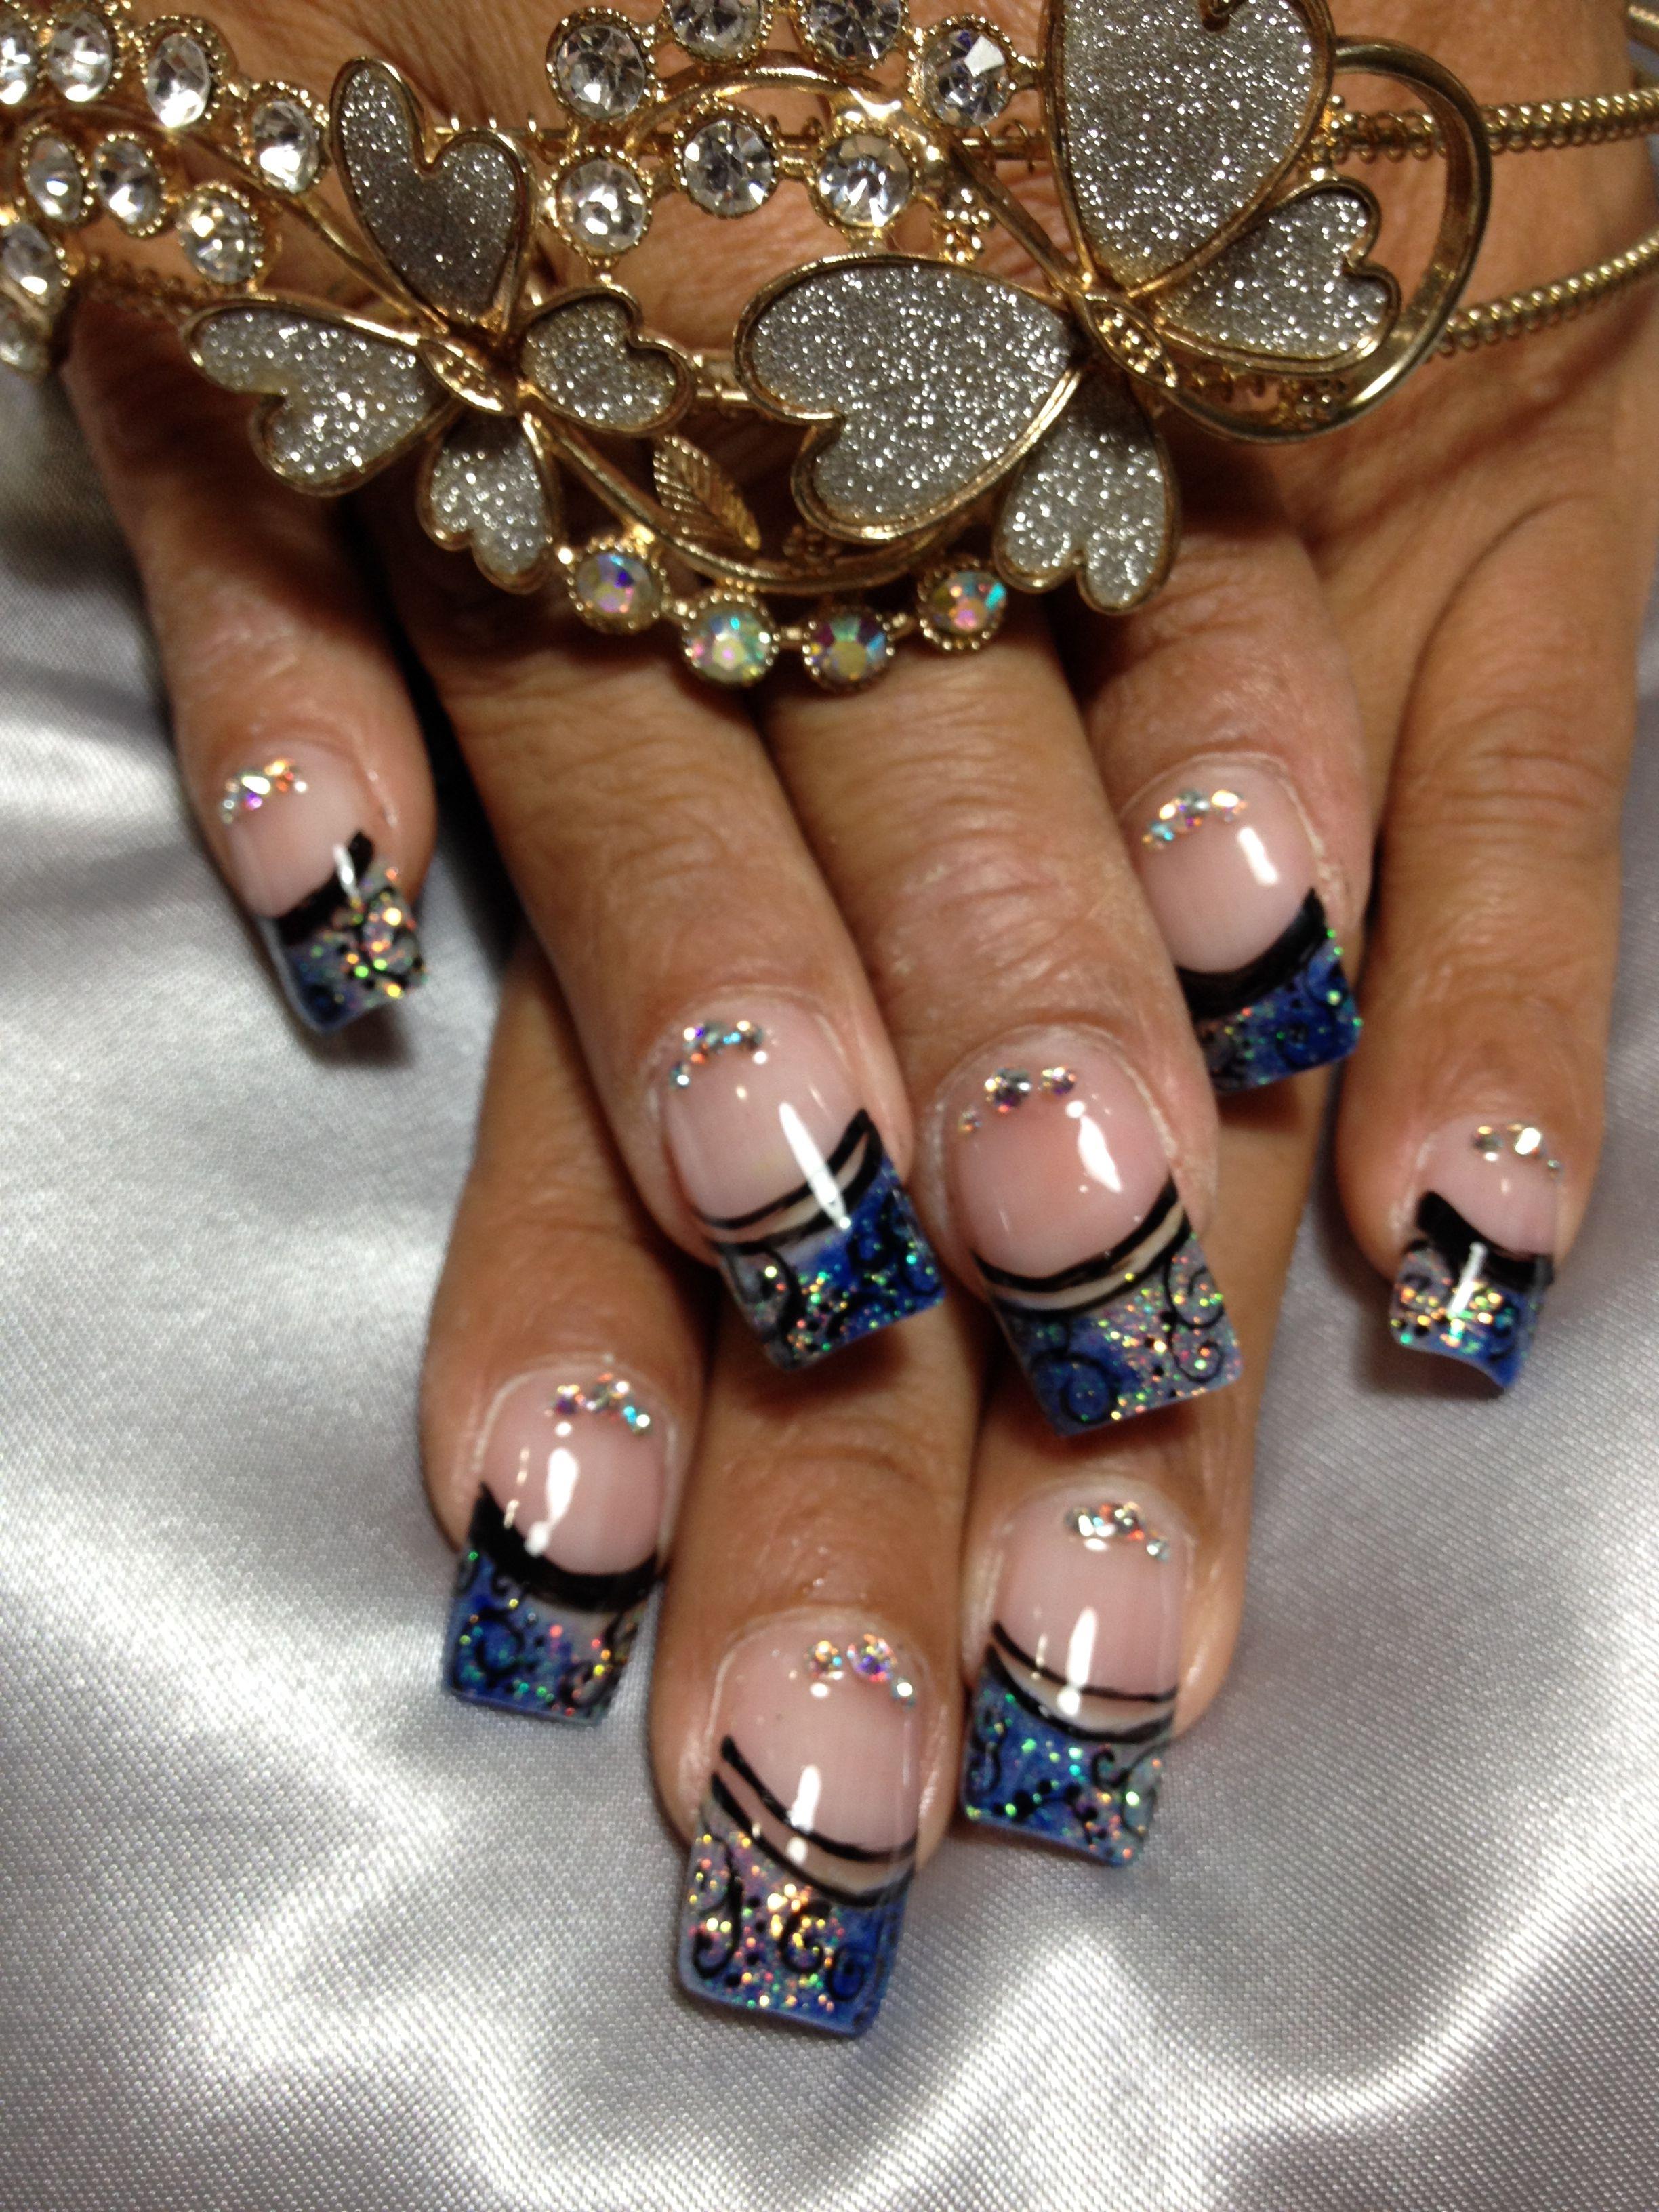 Acrylic nail designs nails by laura sandoval salón pinterest